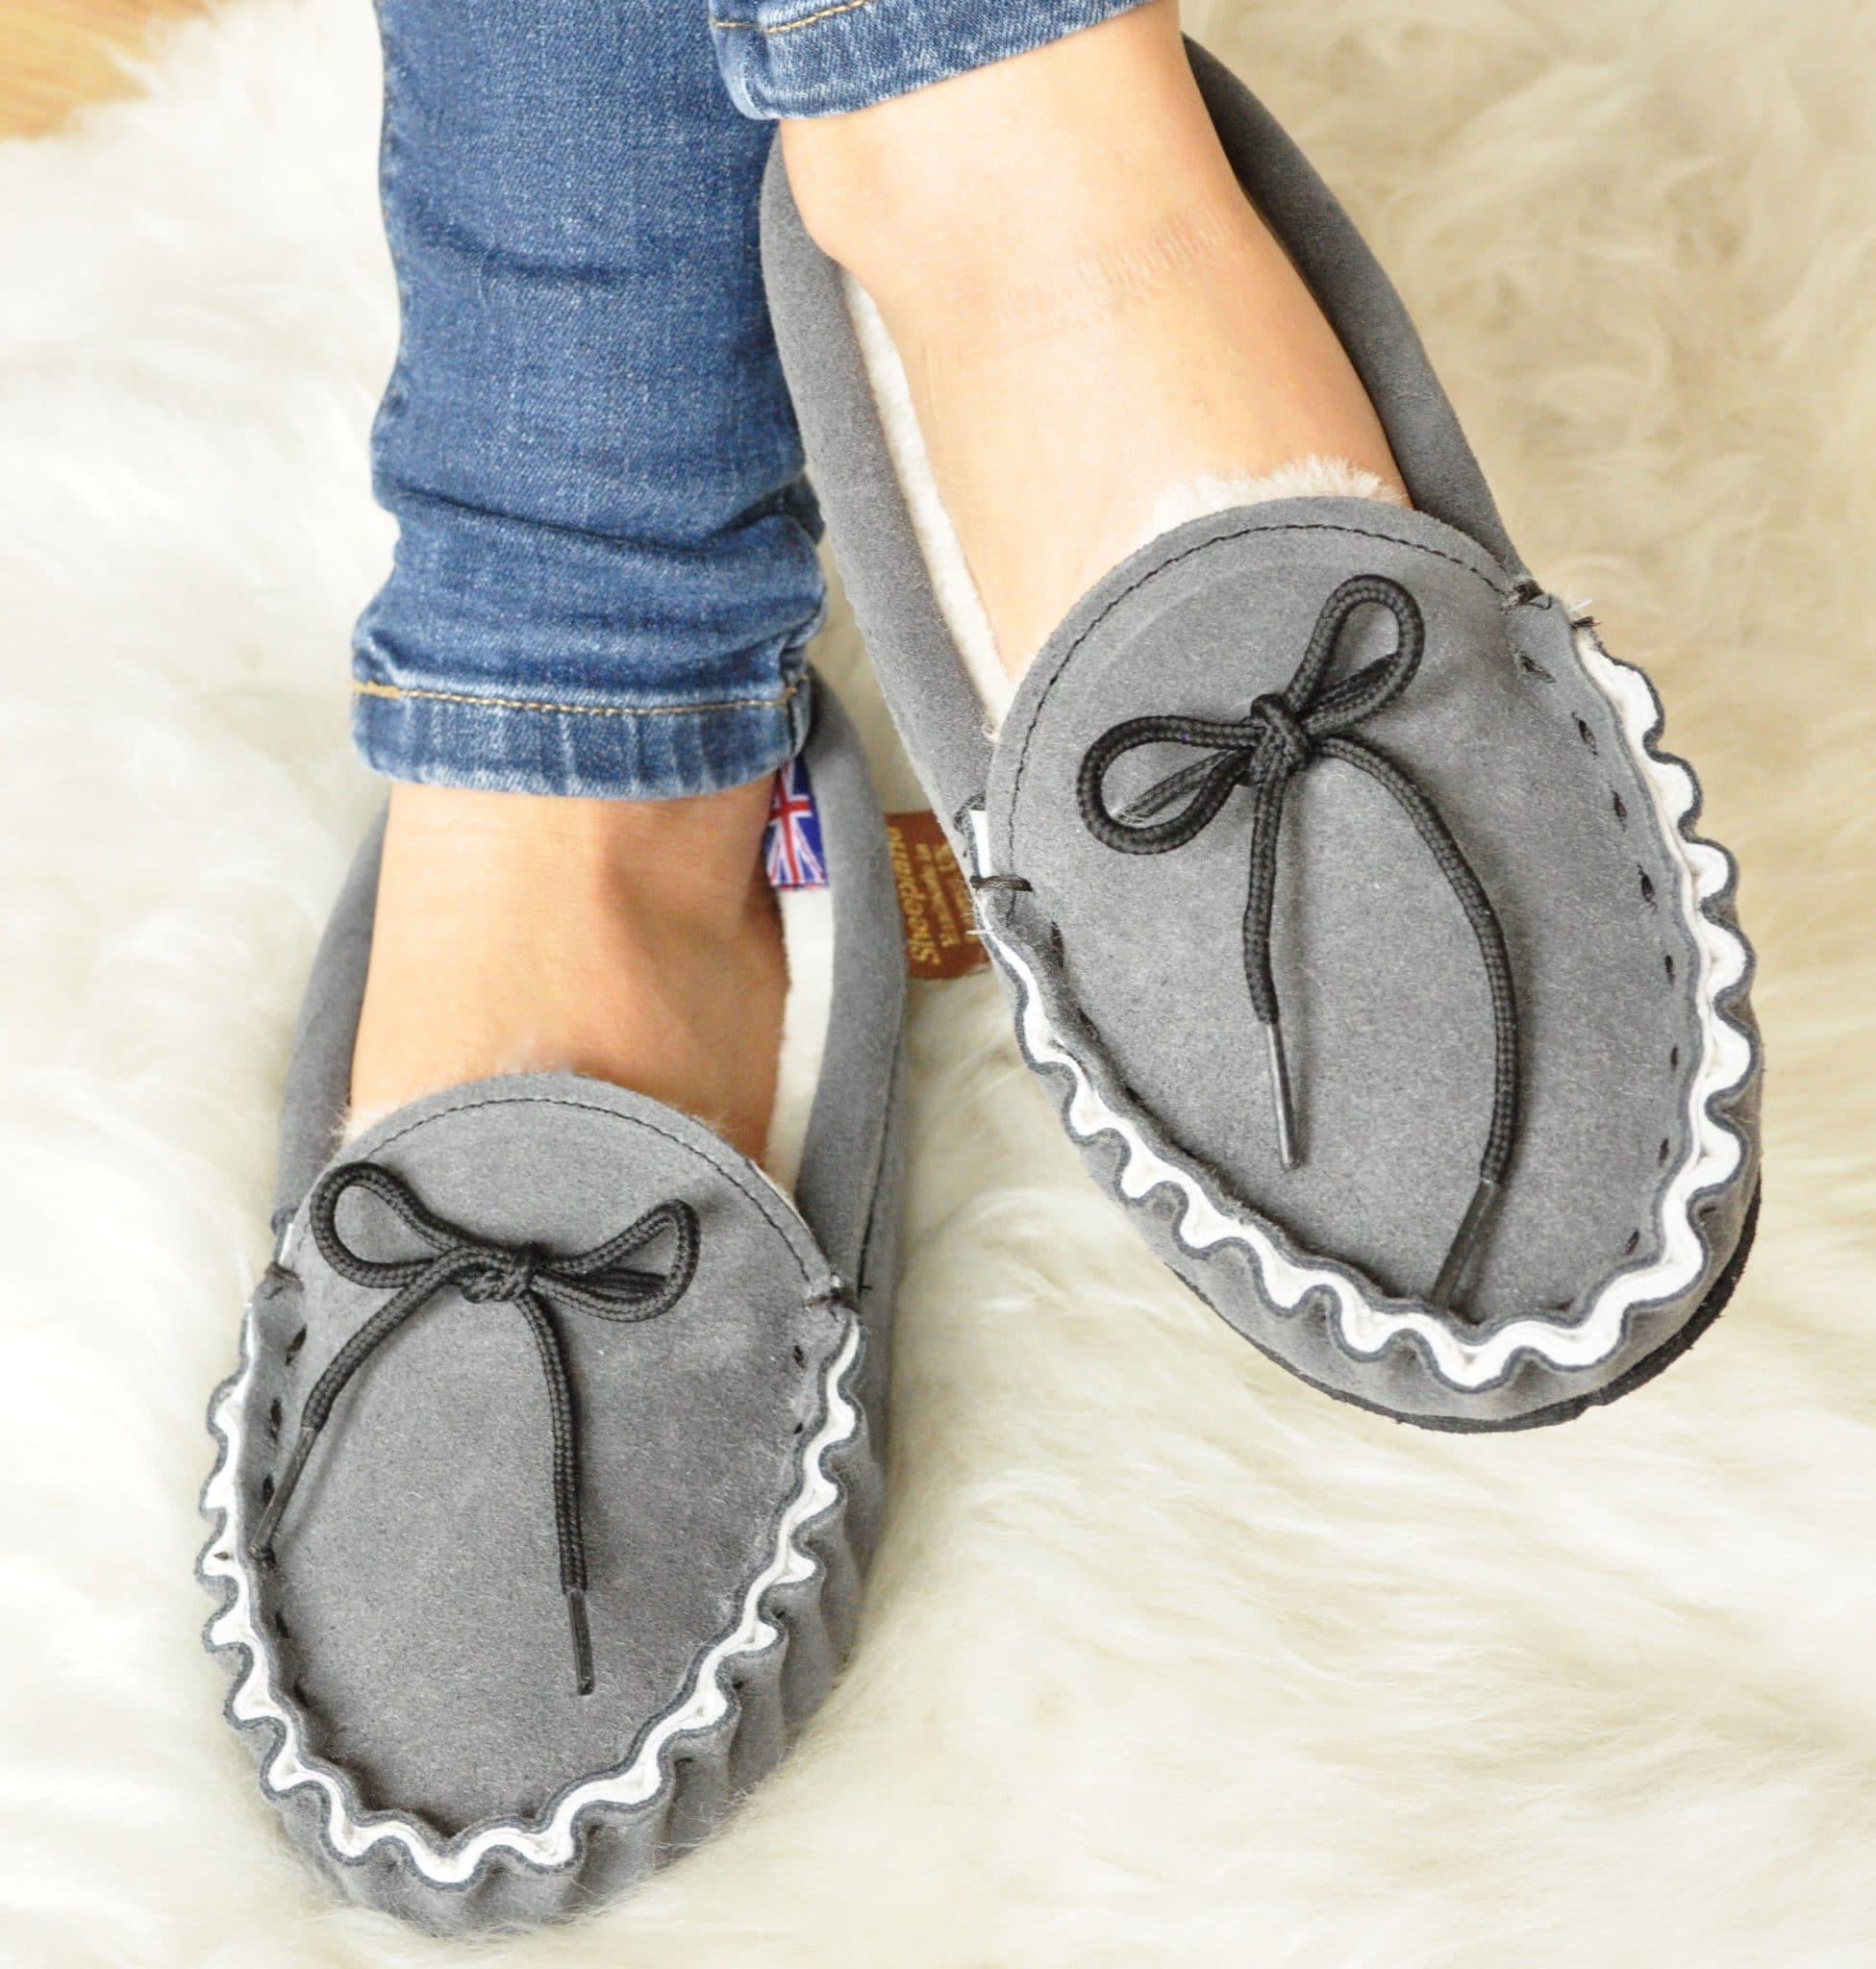 Somerset Handmade British Sheepskin Moccasin Slippers In Grey